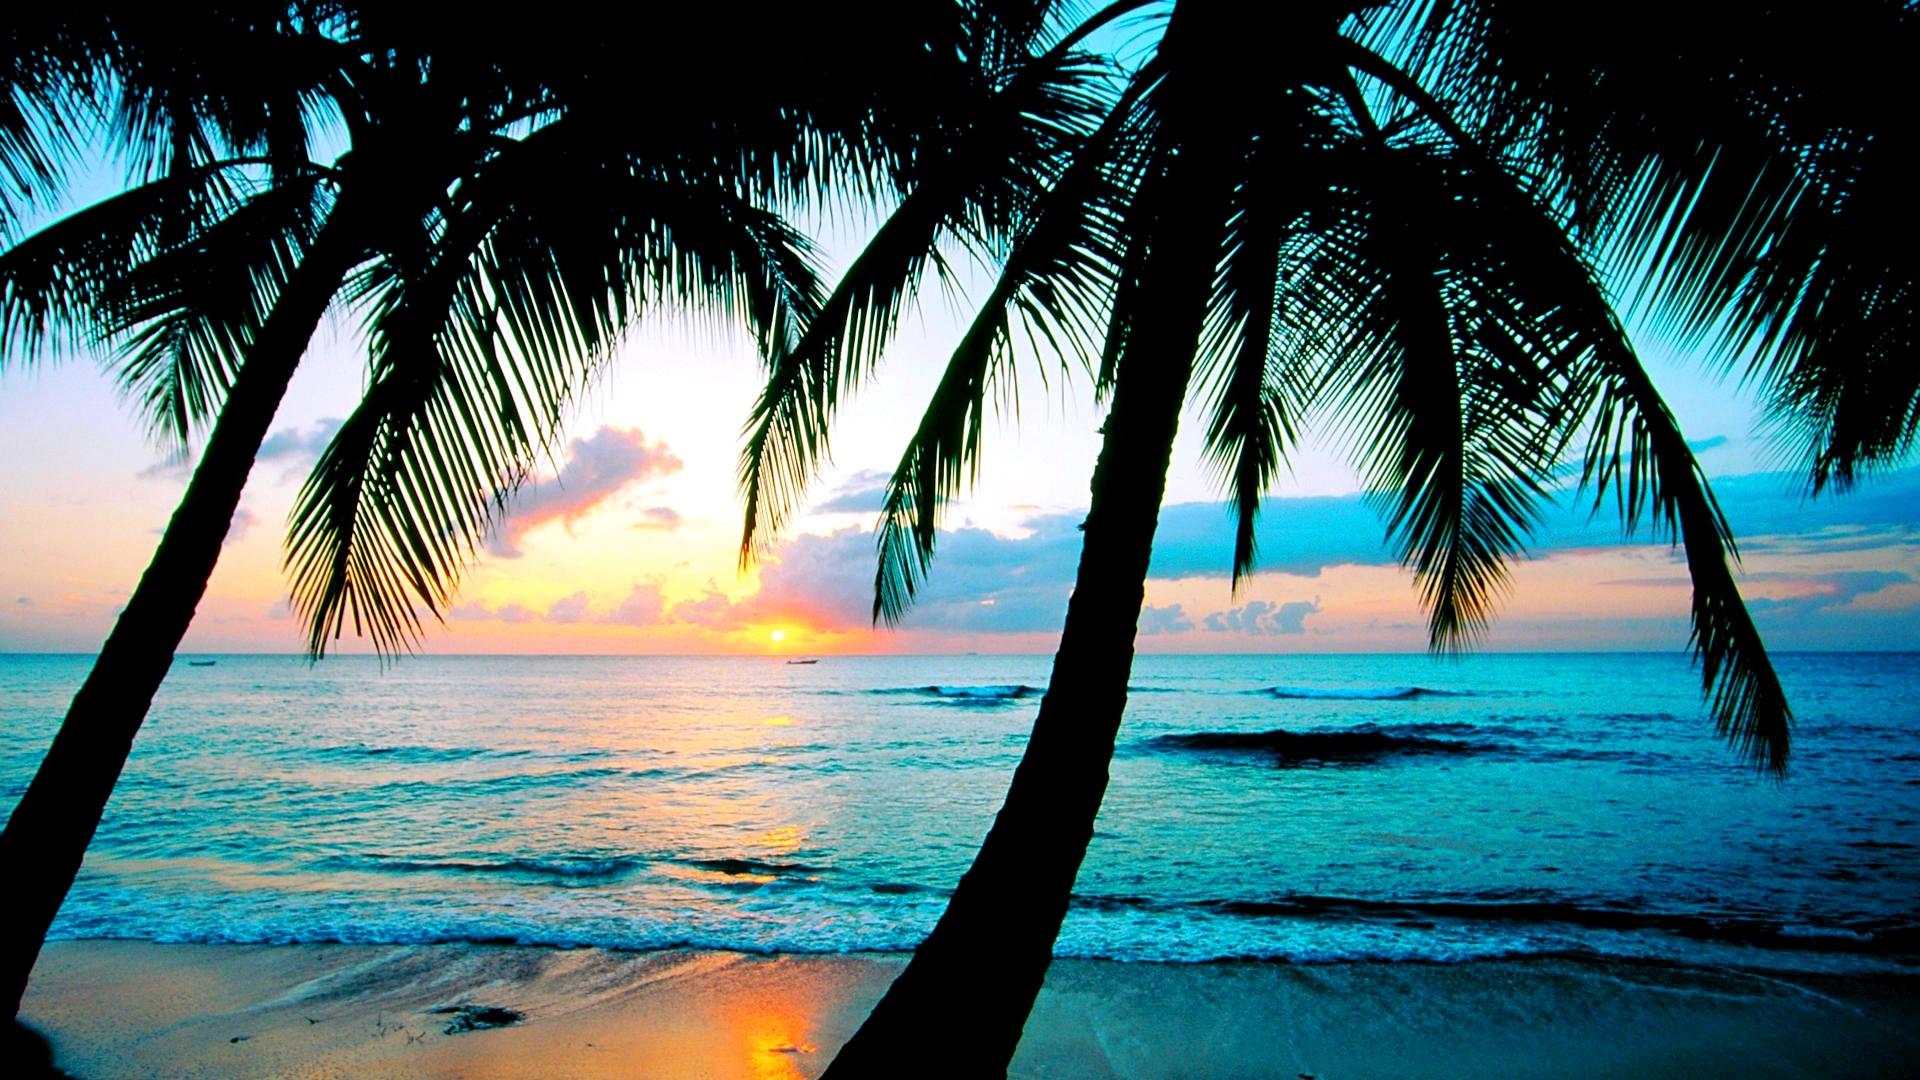 beach desktop wallpapers download   Desktop Backgrounds for Free HD .